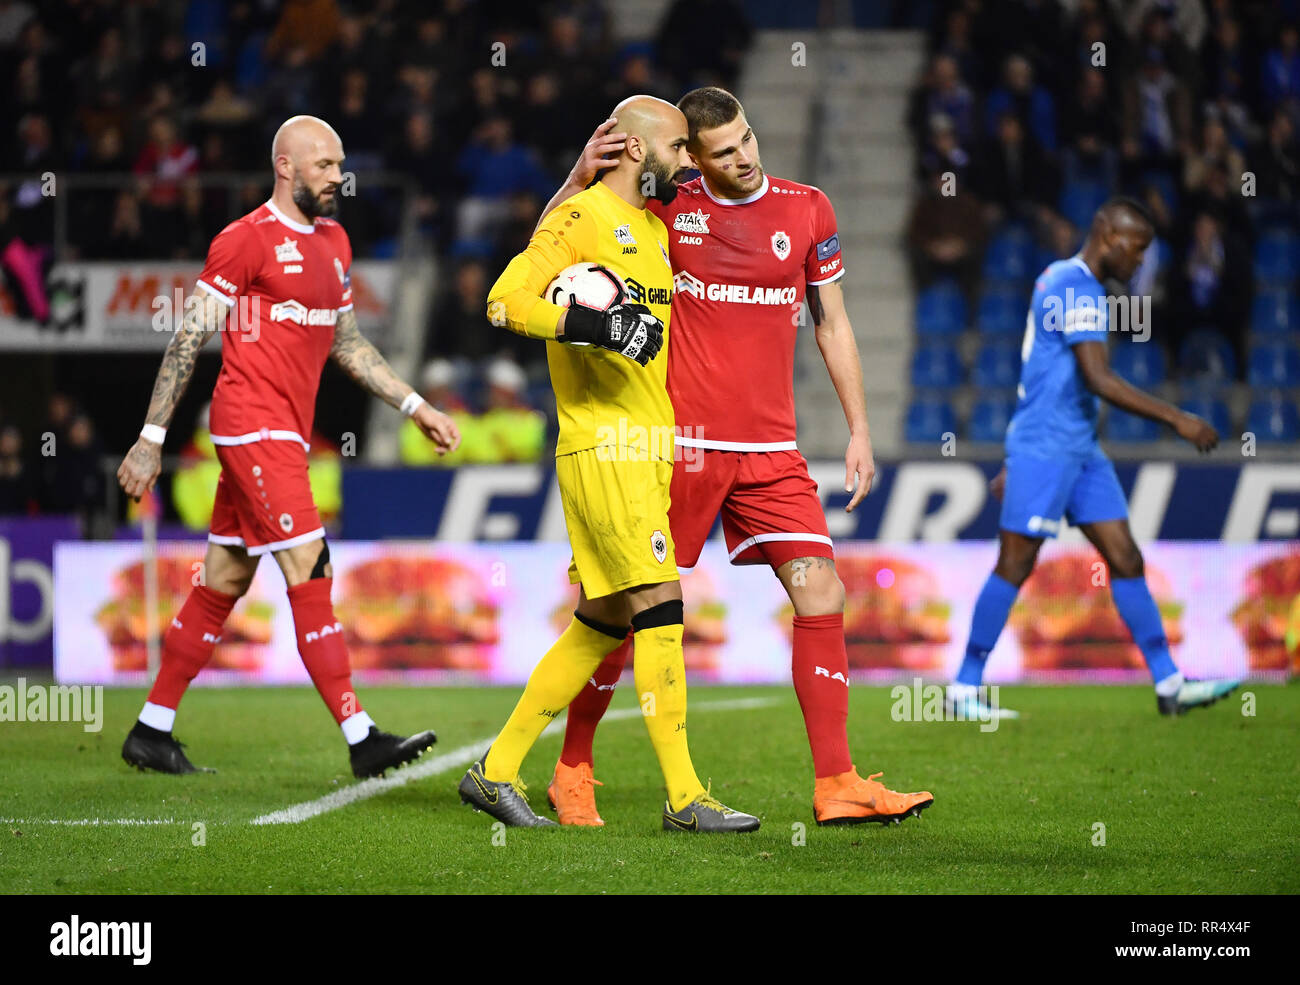 Genk Belgium February 24 Sinan Bolat Of Antwerp And Dino Arslanagic Of Antwerp During The Jupiler